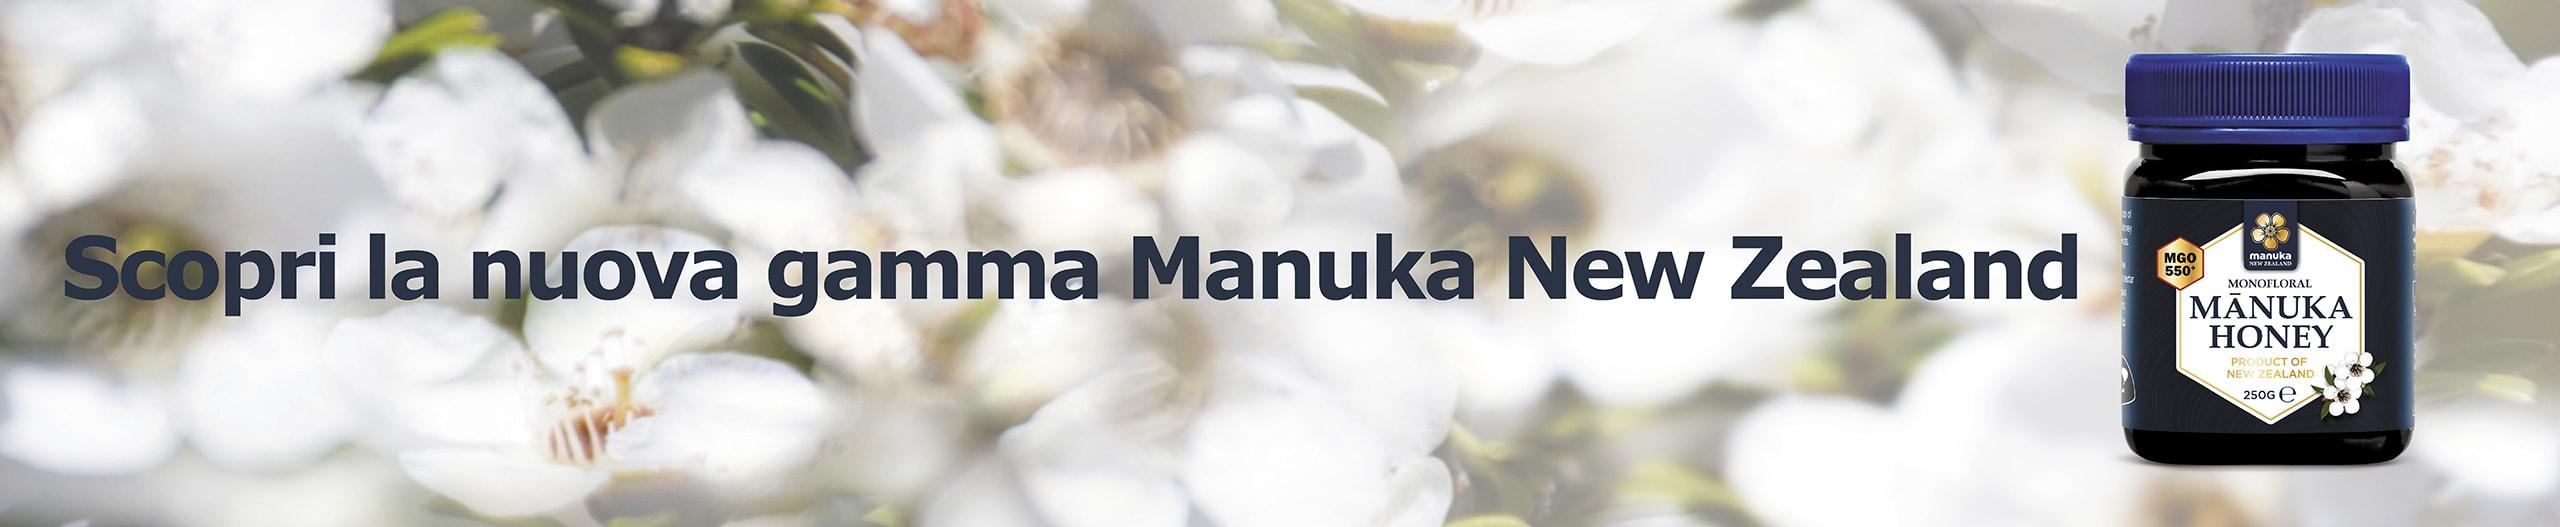 https://www.saluteinerba.com/brands/manuka-new-zealand/